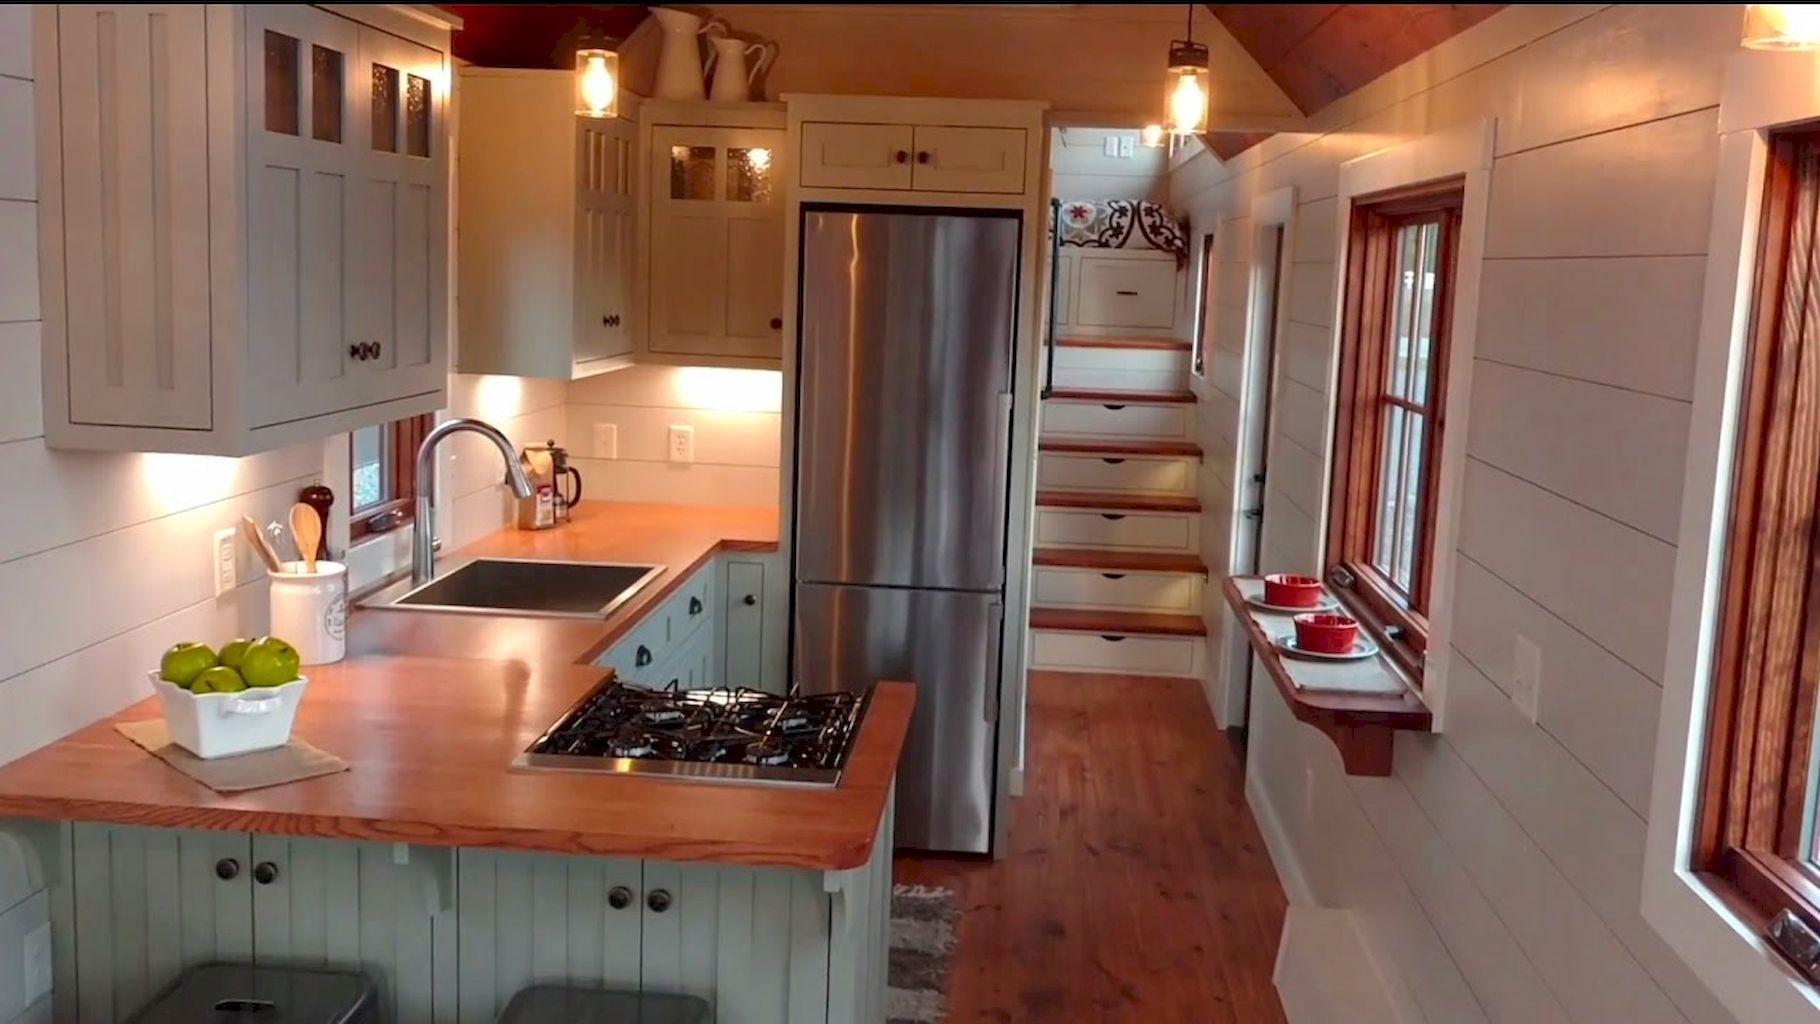 Impressive tiny house kitchen maximize space ideas (31